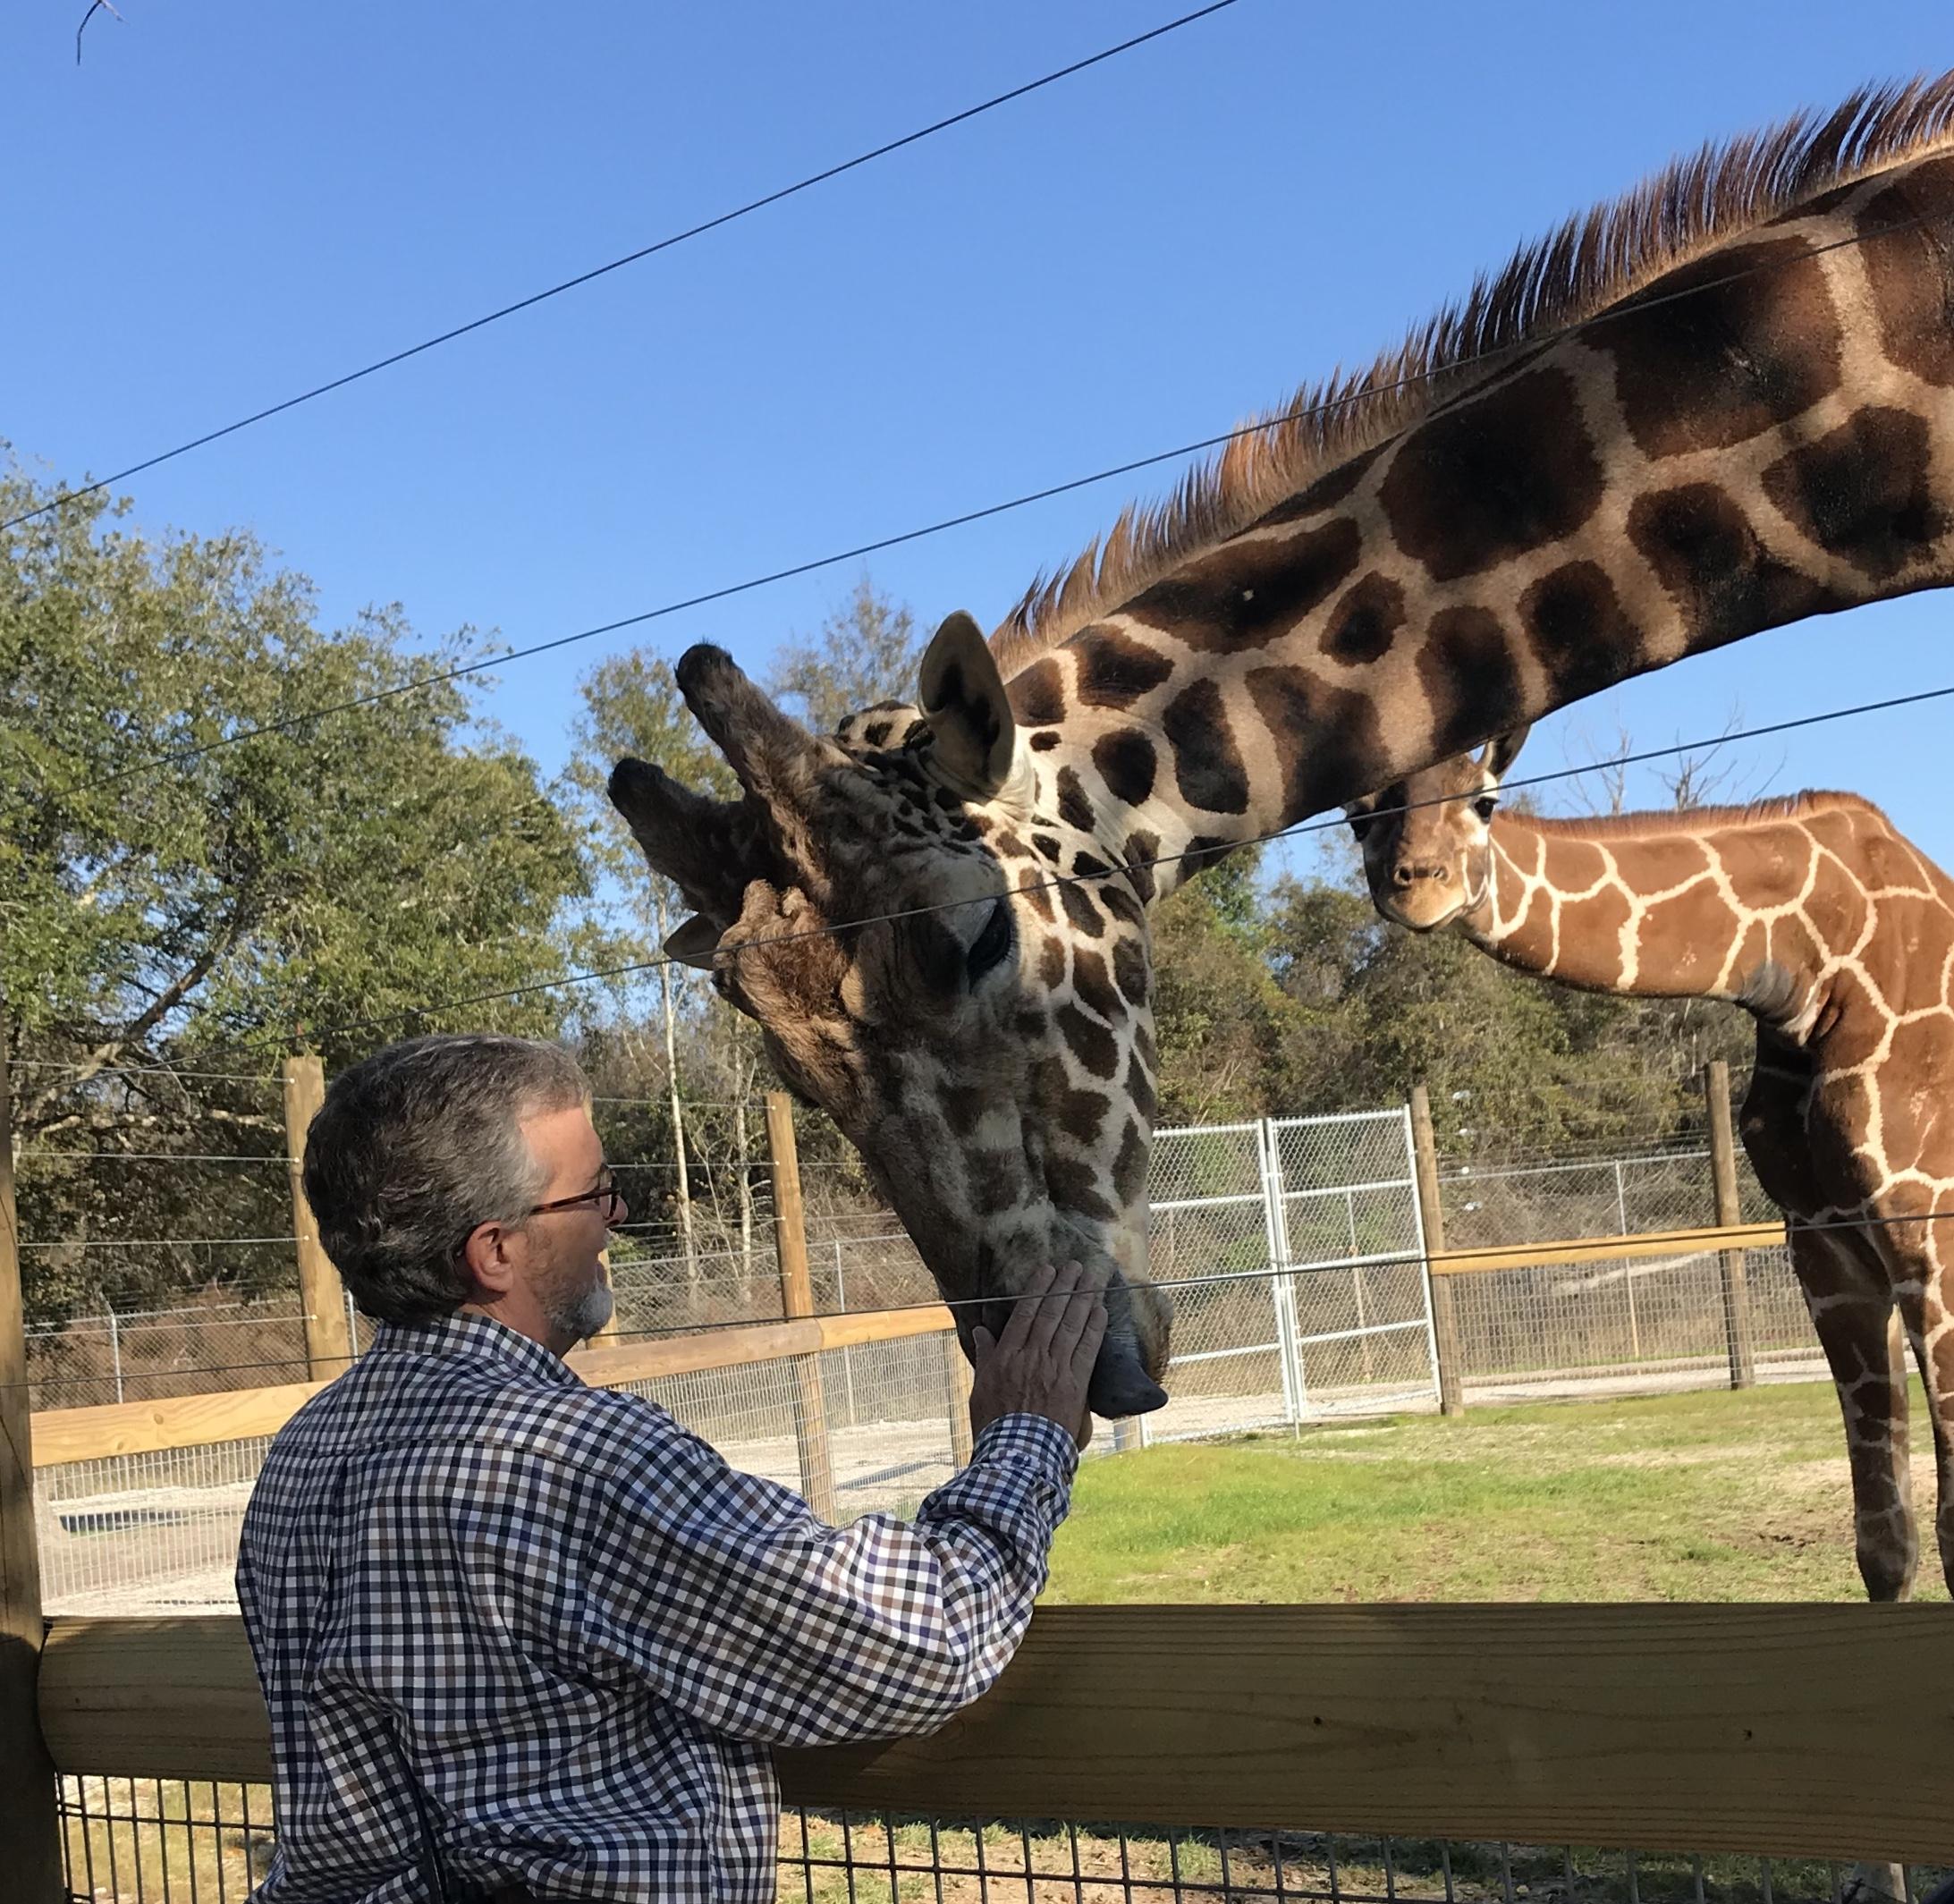 Giraffe with zoo director